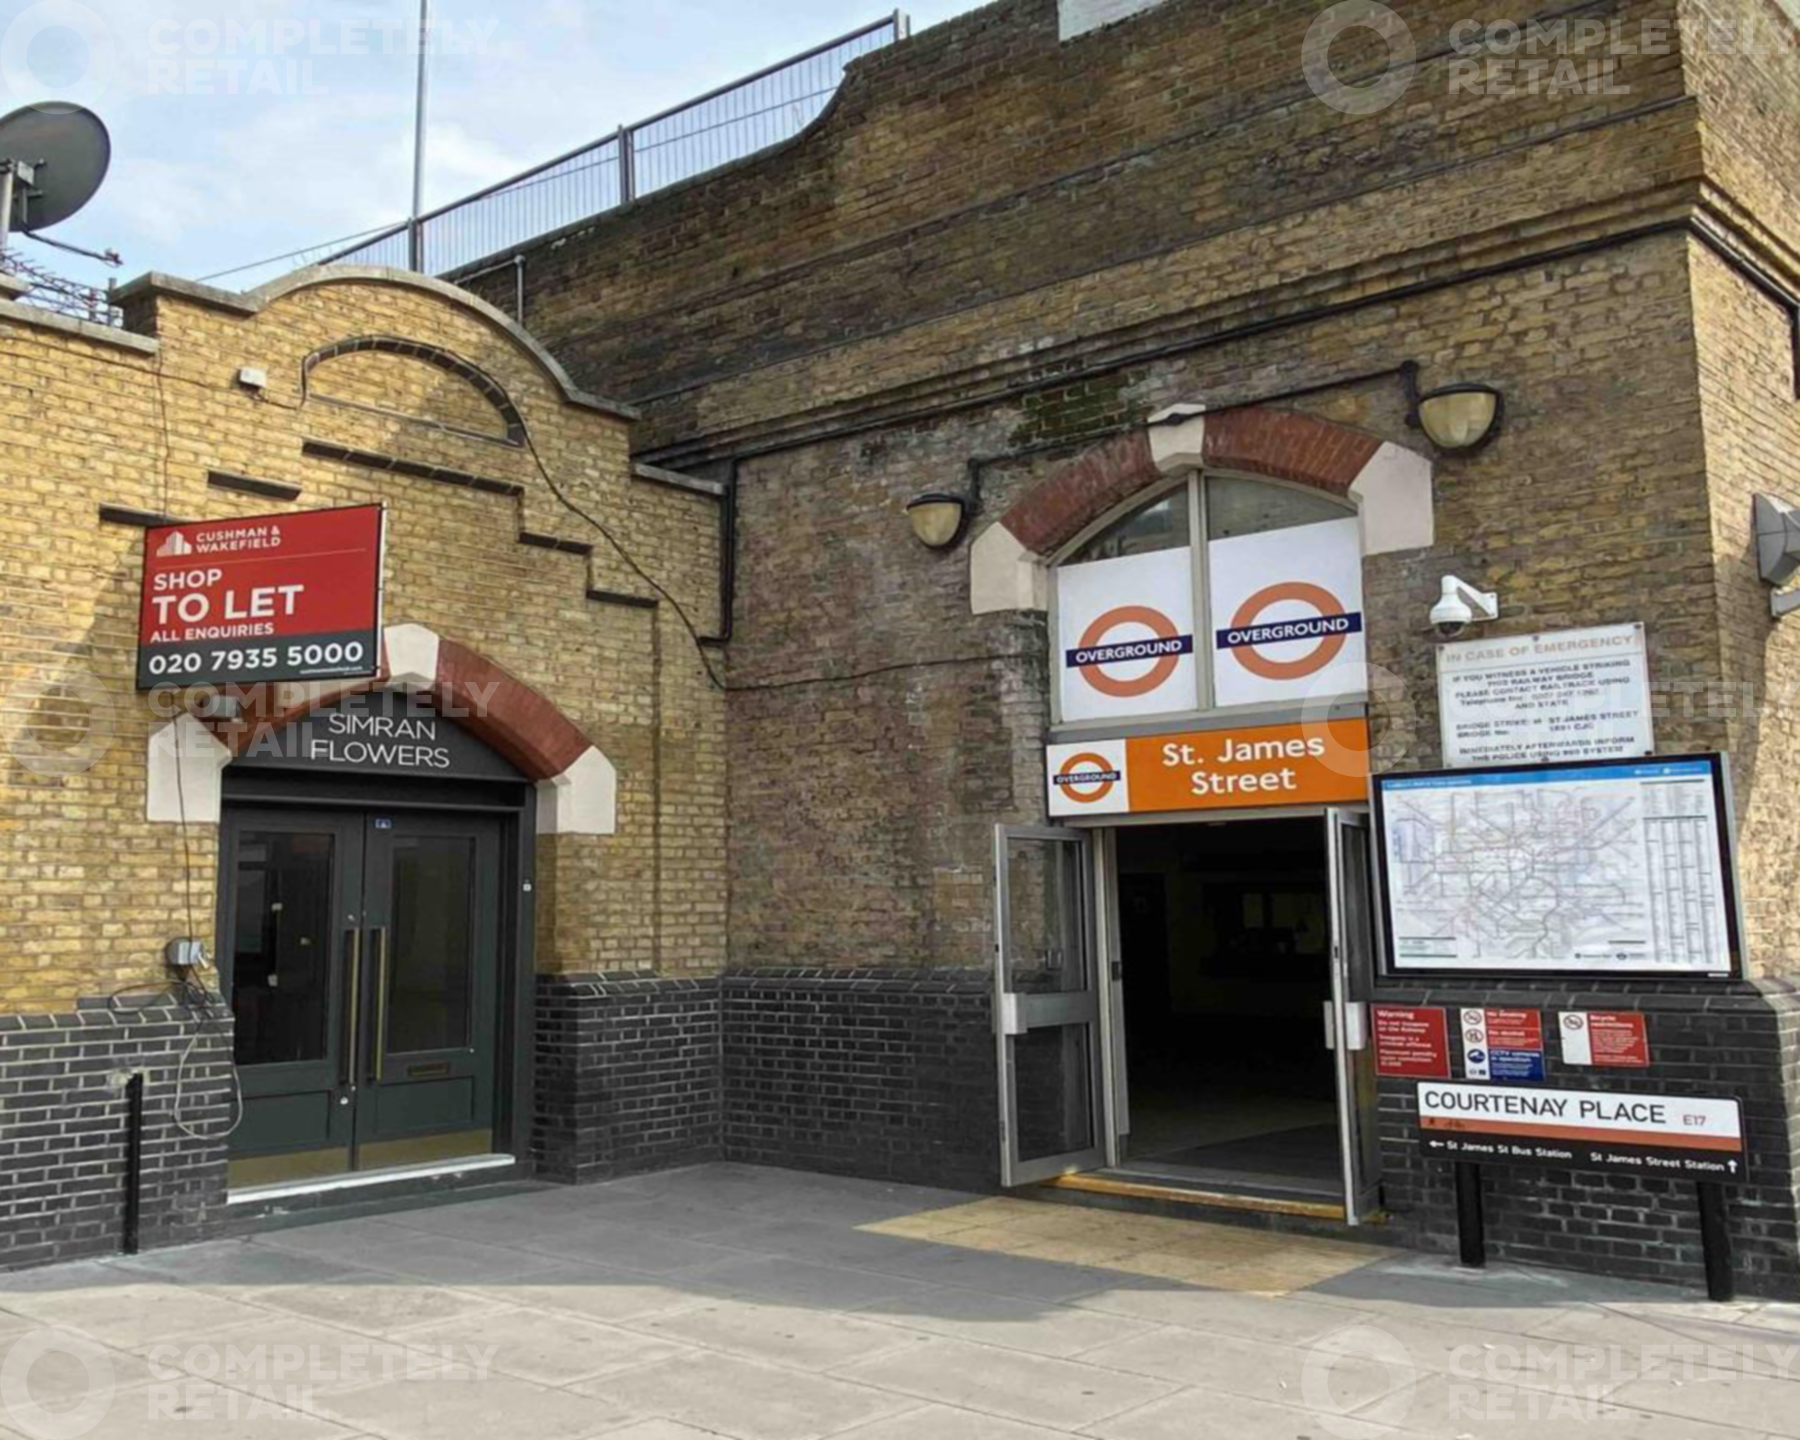 St James Street Station